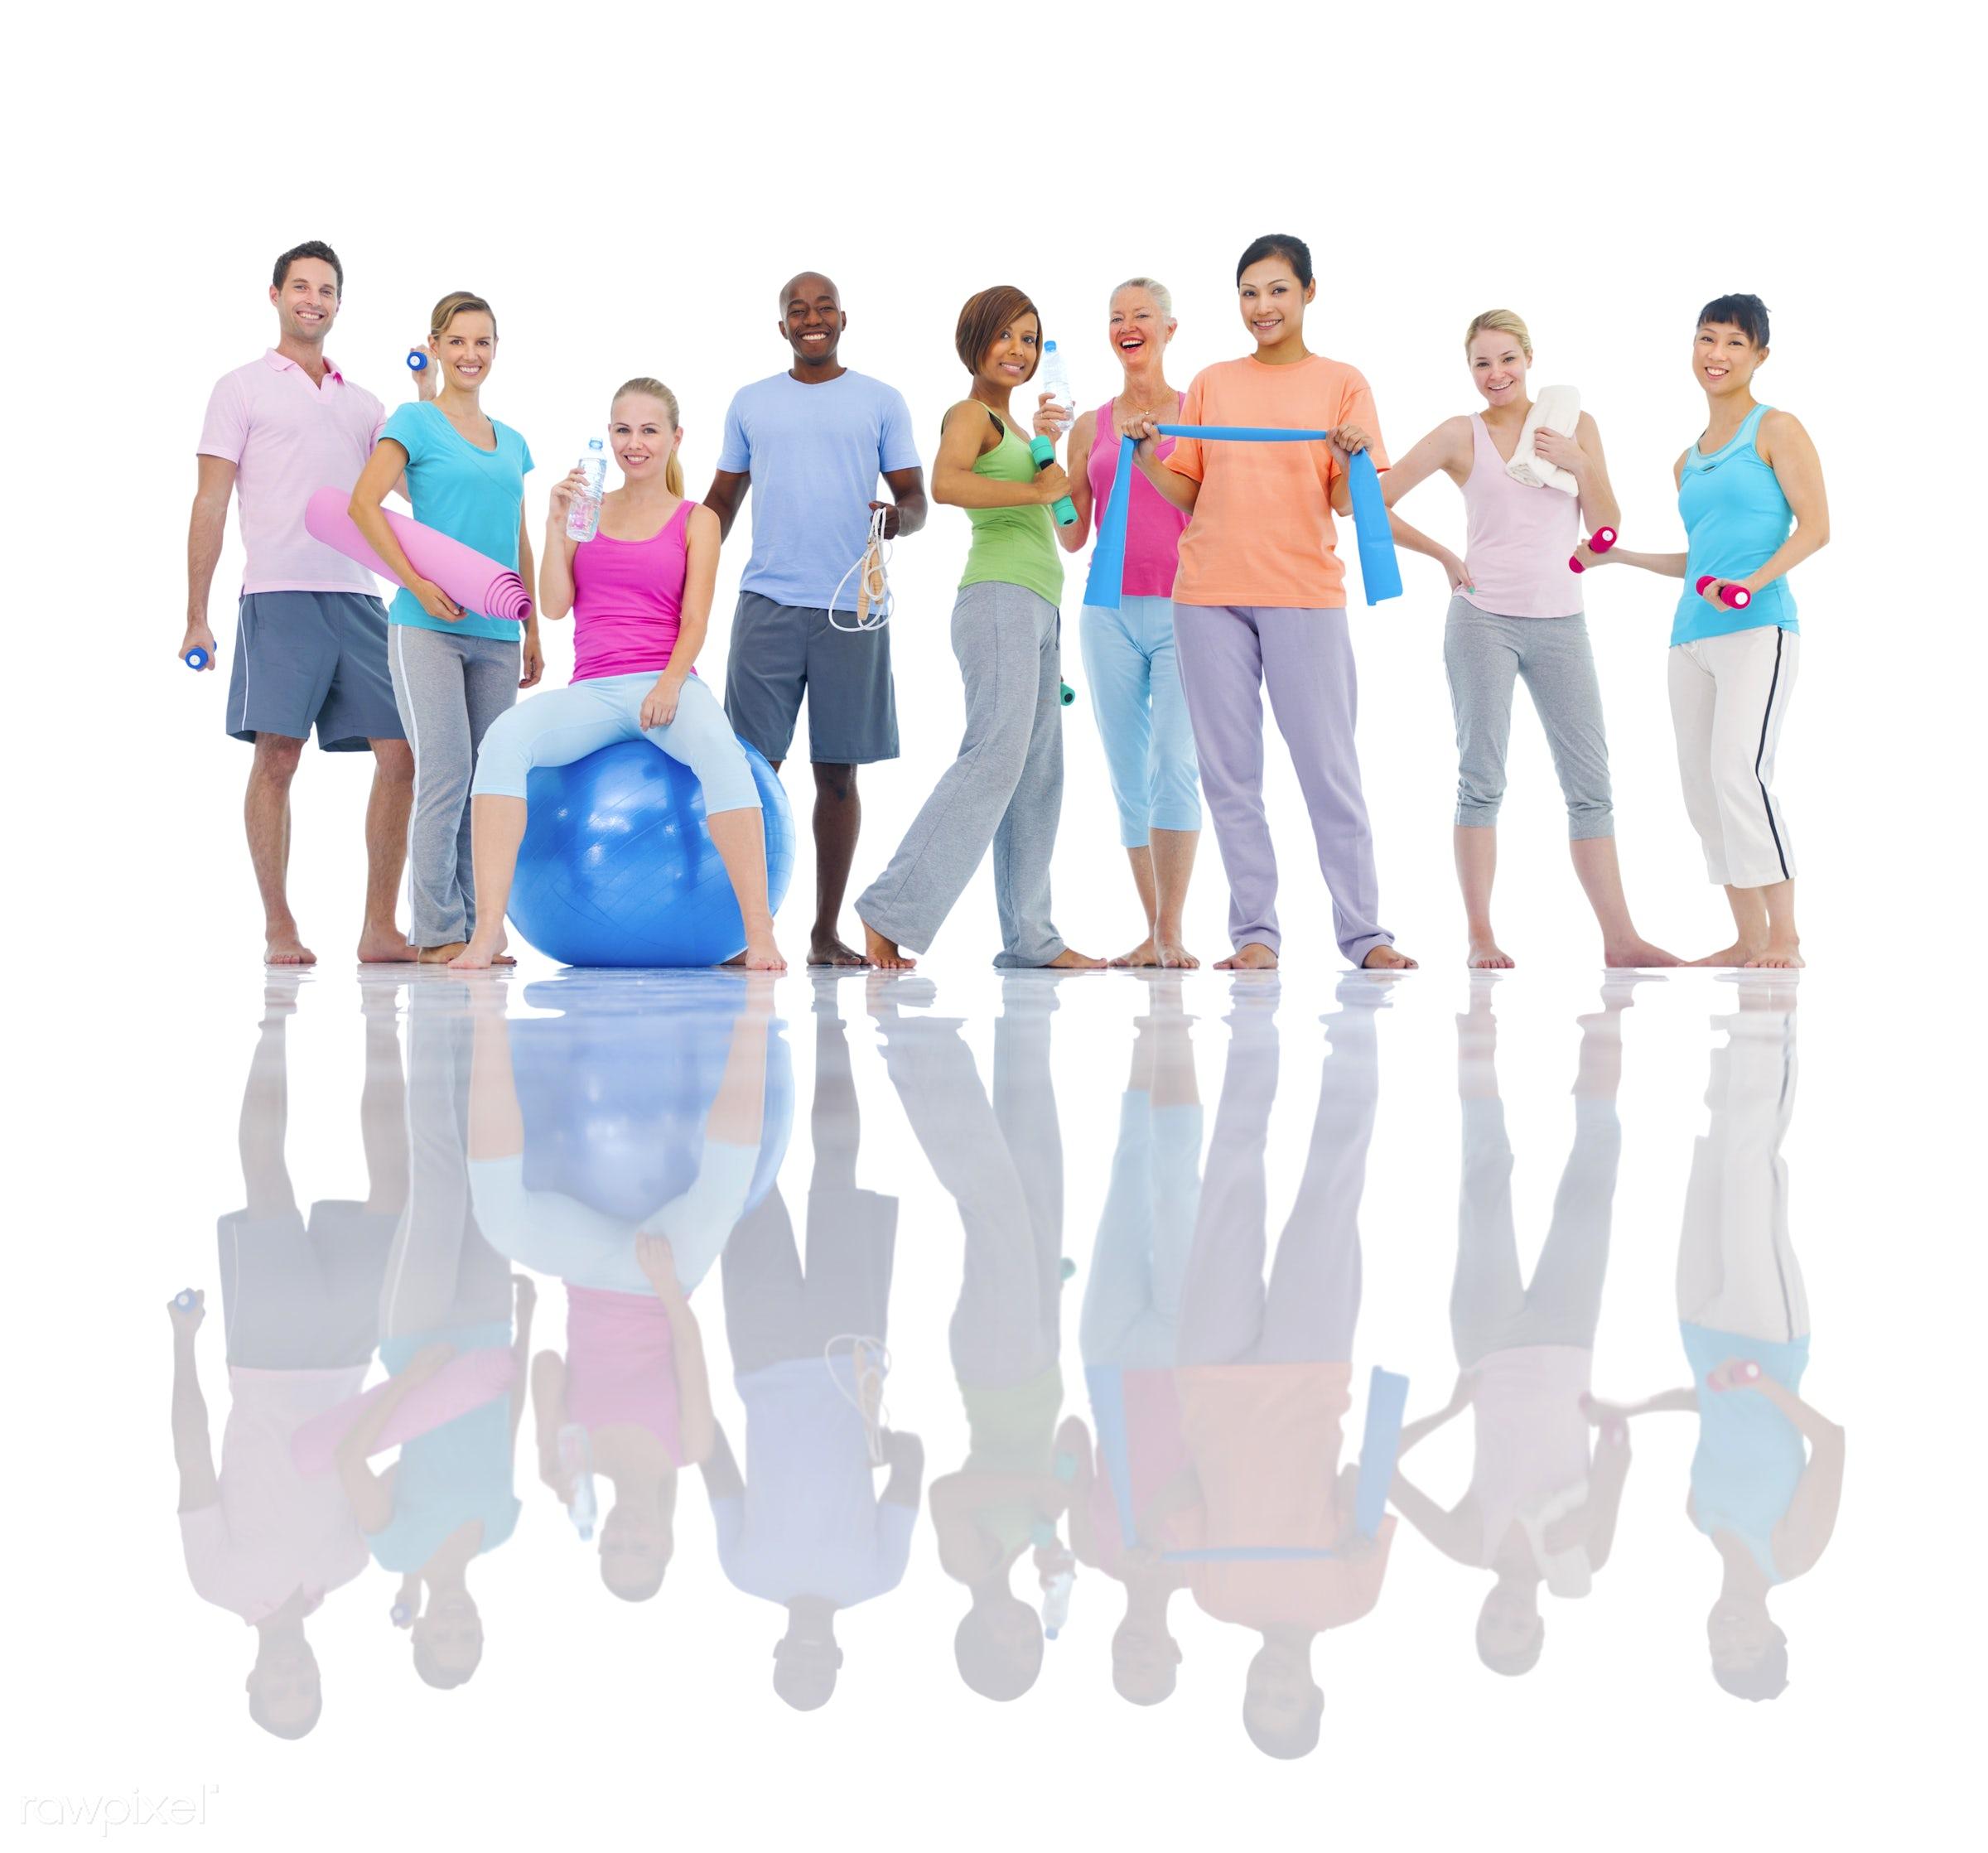 caucasian, lifestyles, activity, adult, african descent, asian ethnicity, balance, body care, break, cheerful, classroom,...